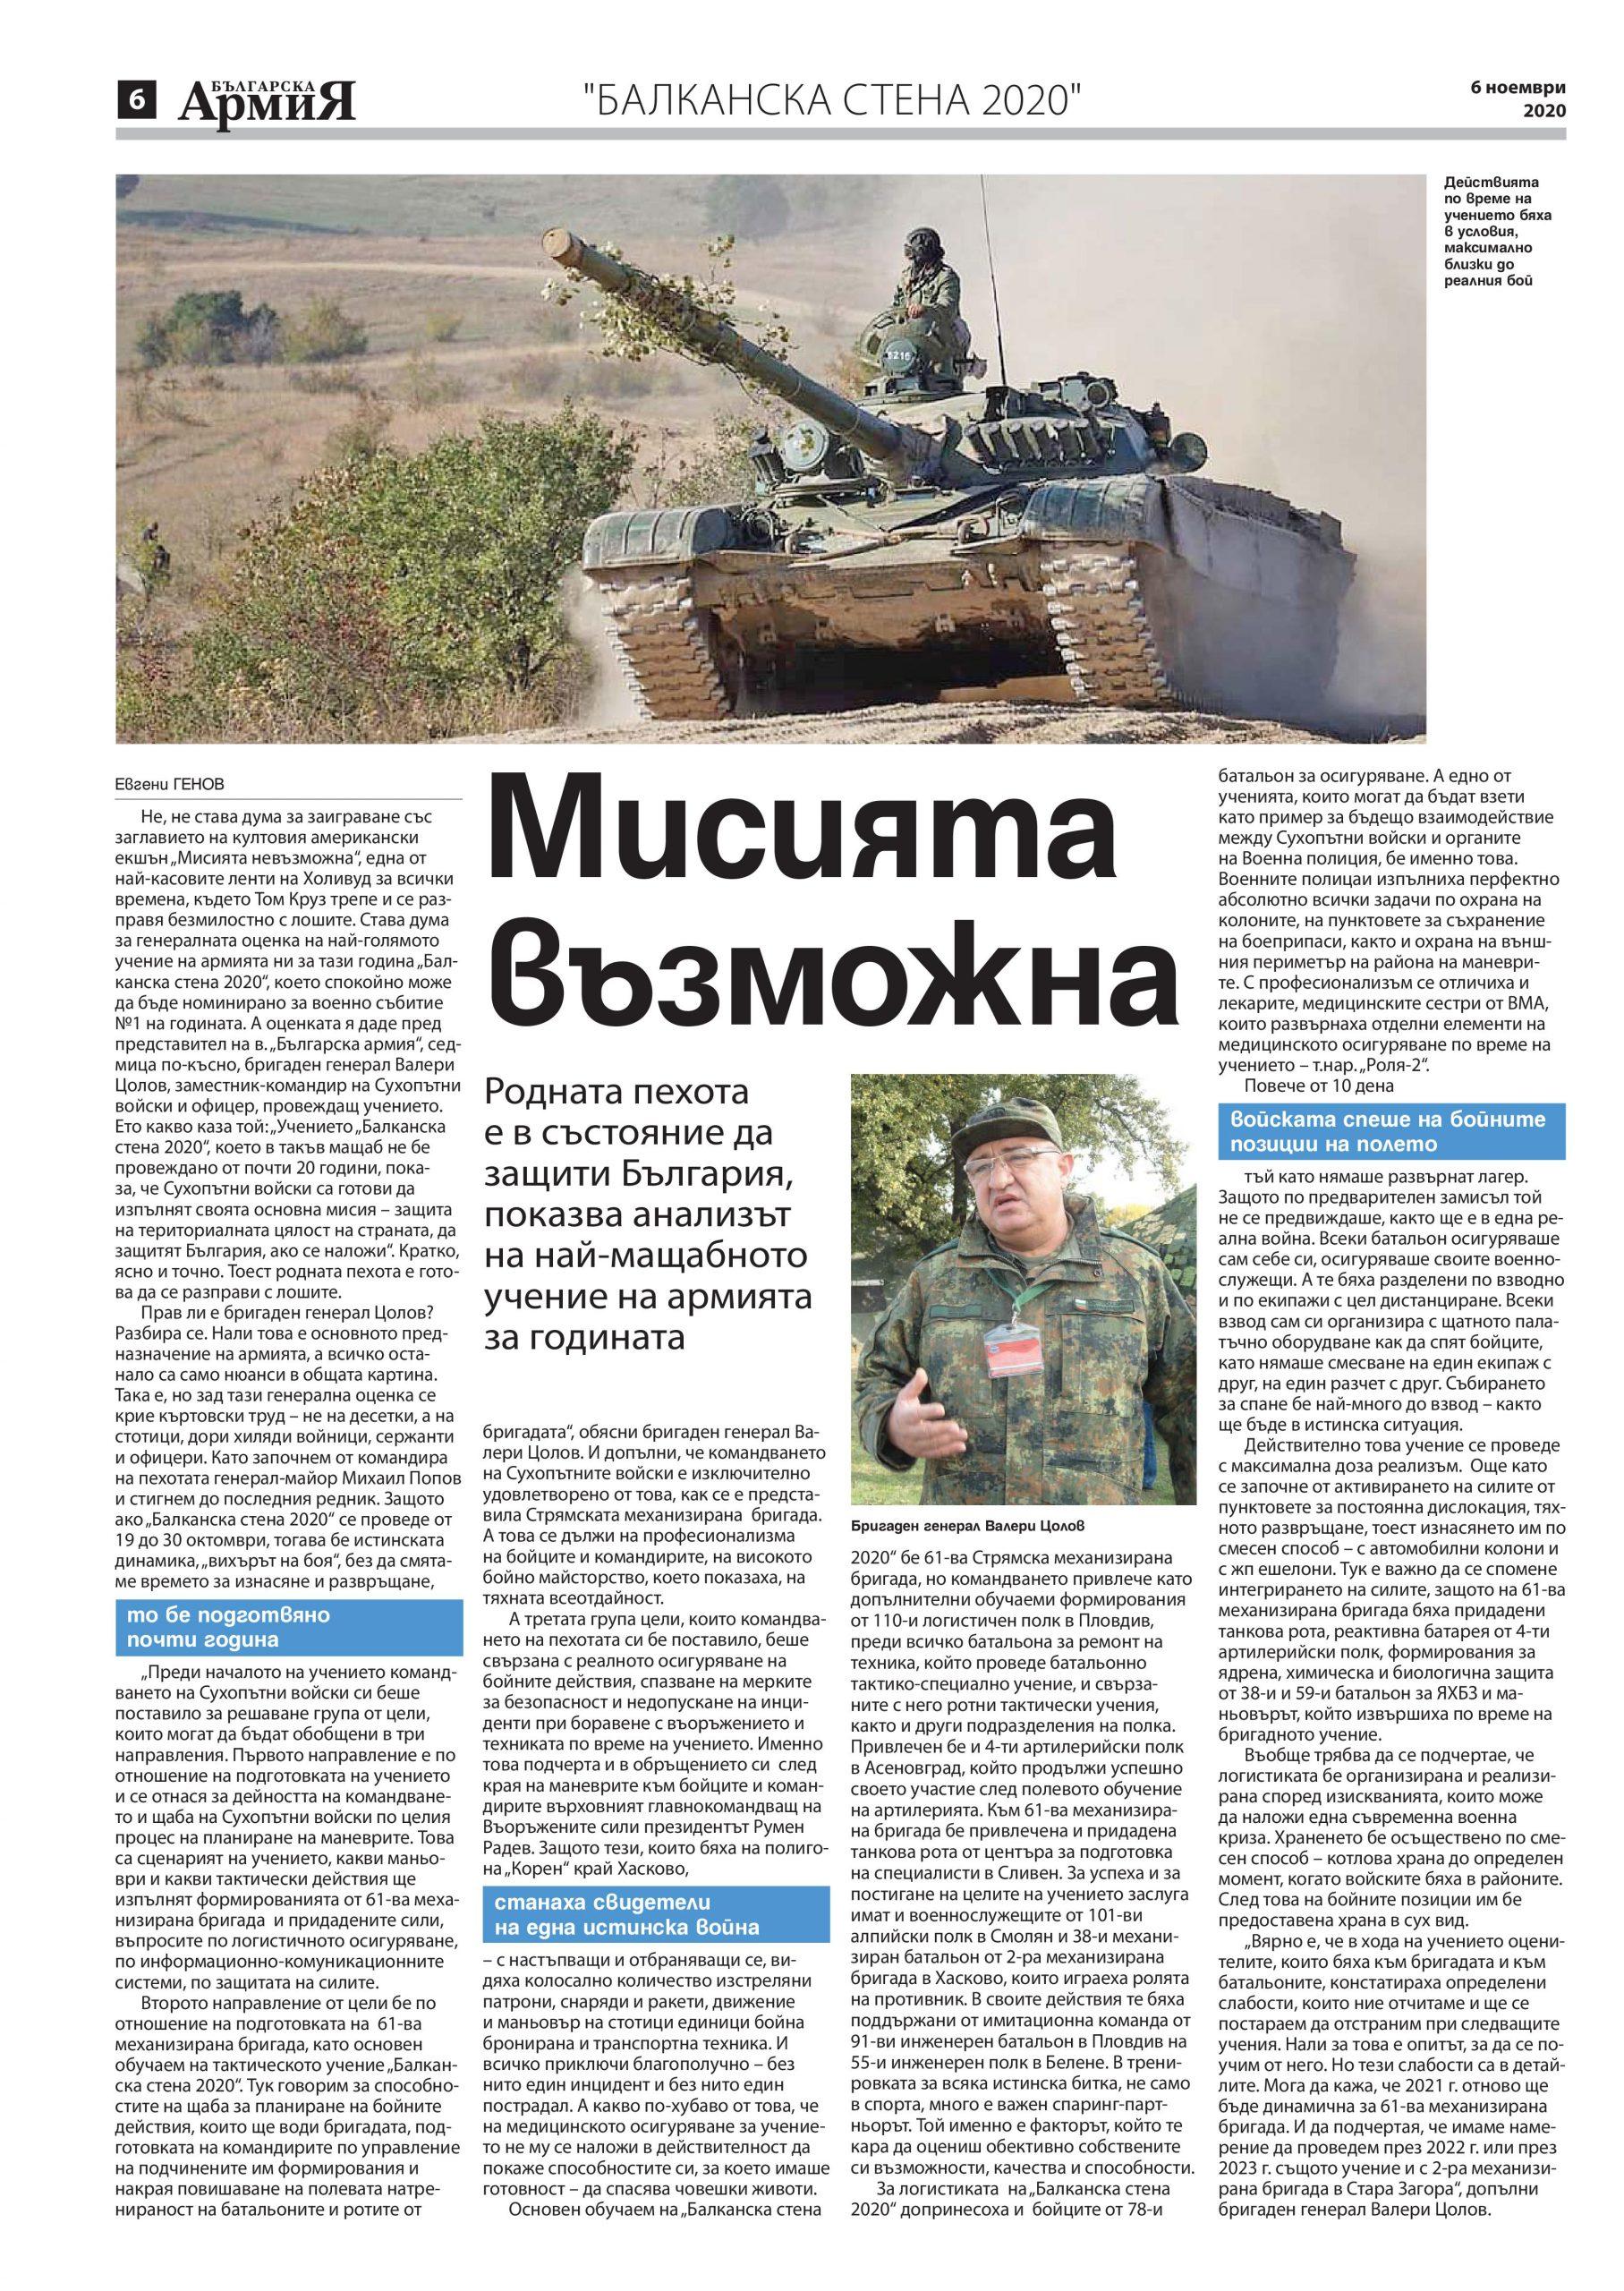 https://armymedia.bg/wp-content/uploads/2015/06/06-46-scaled.jpg